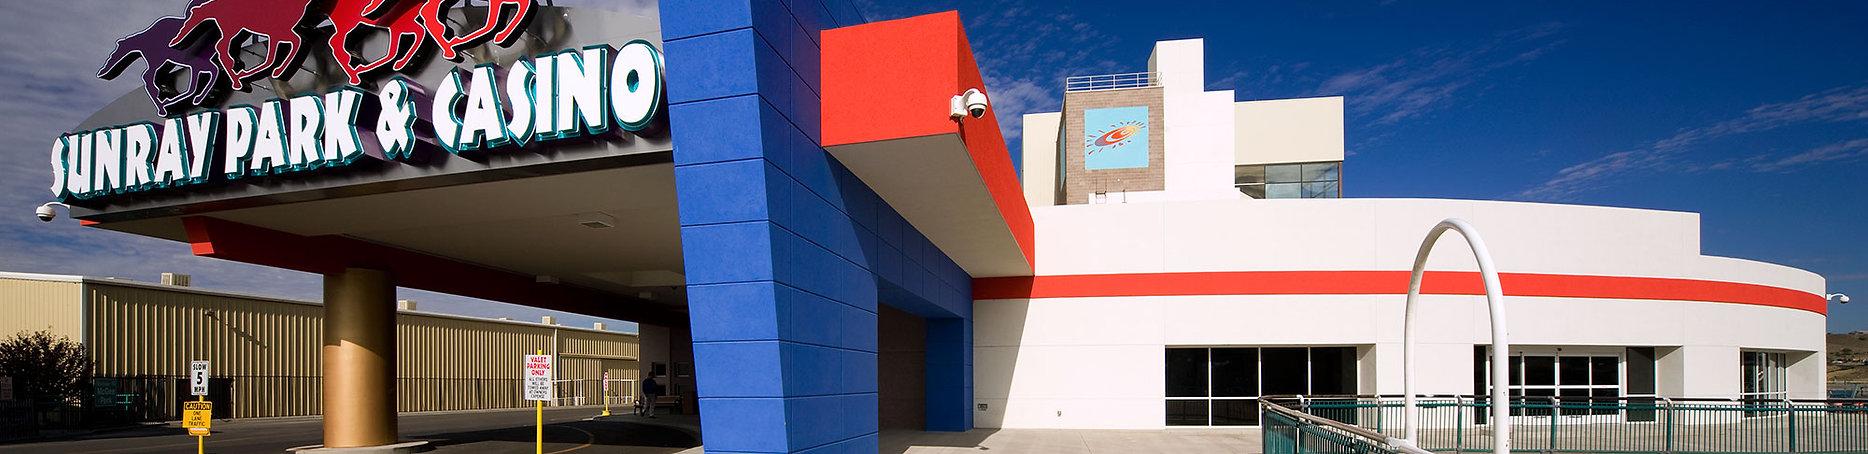 SunrayPark&casino